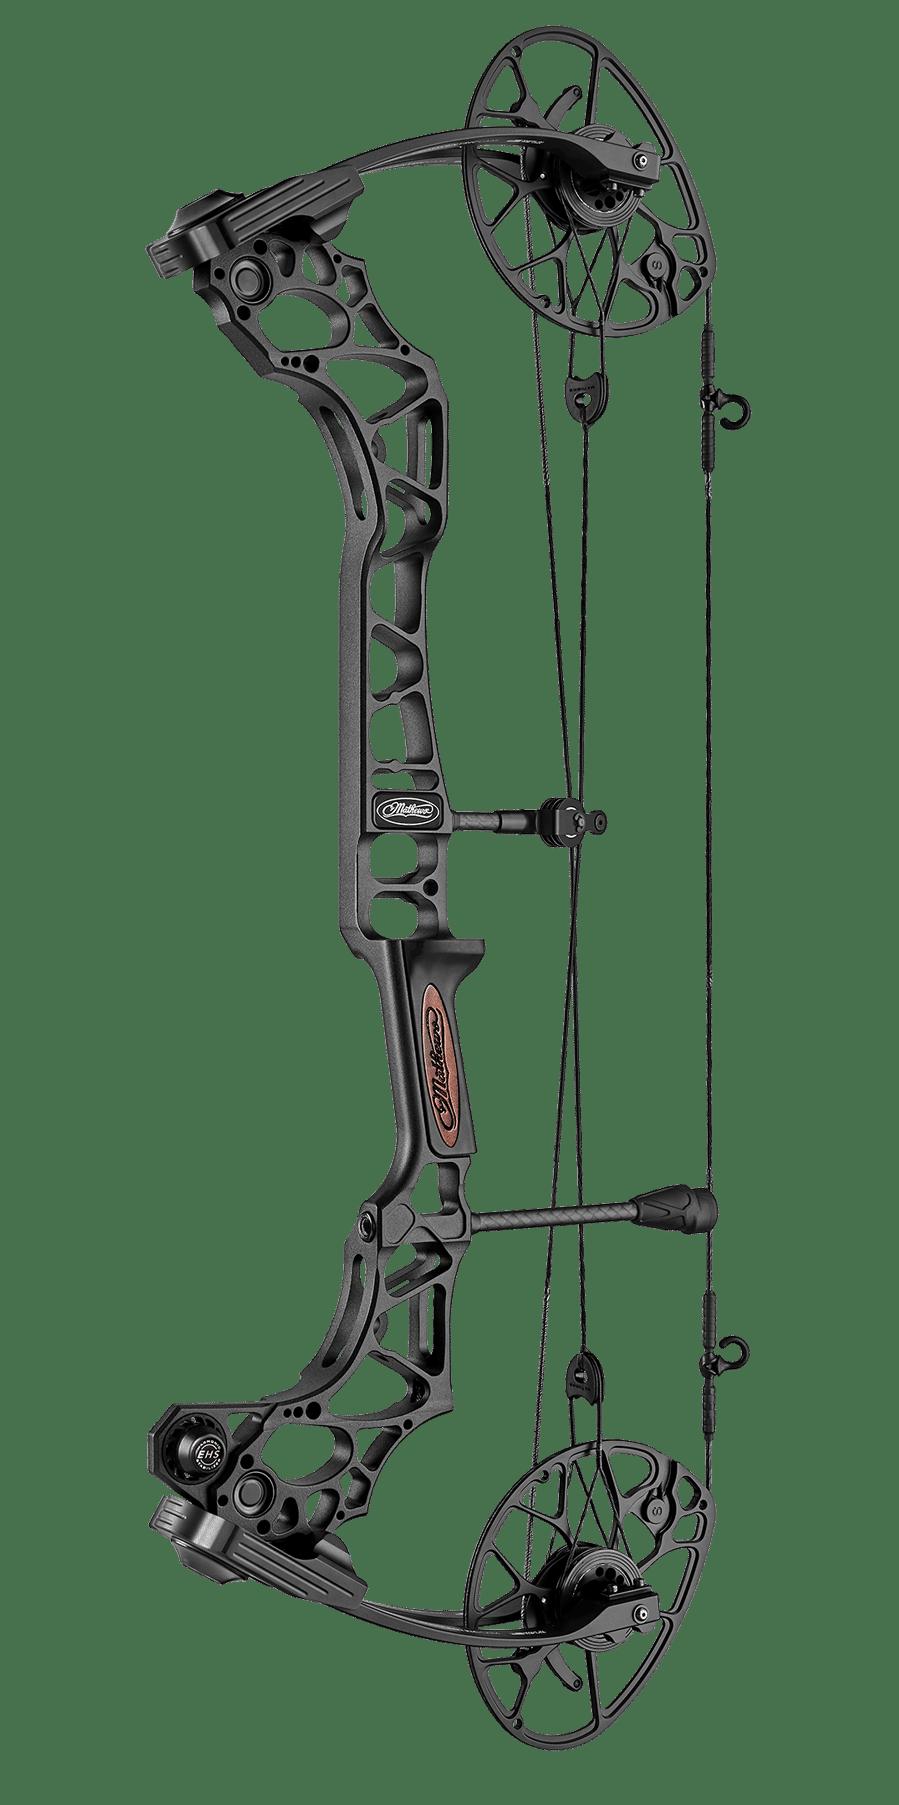 Triax™ | Mathews Archery Mathews Triax | Mathews Archery